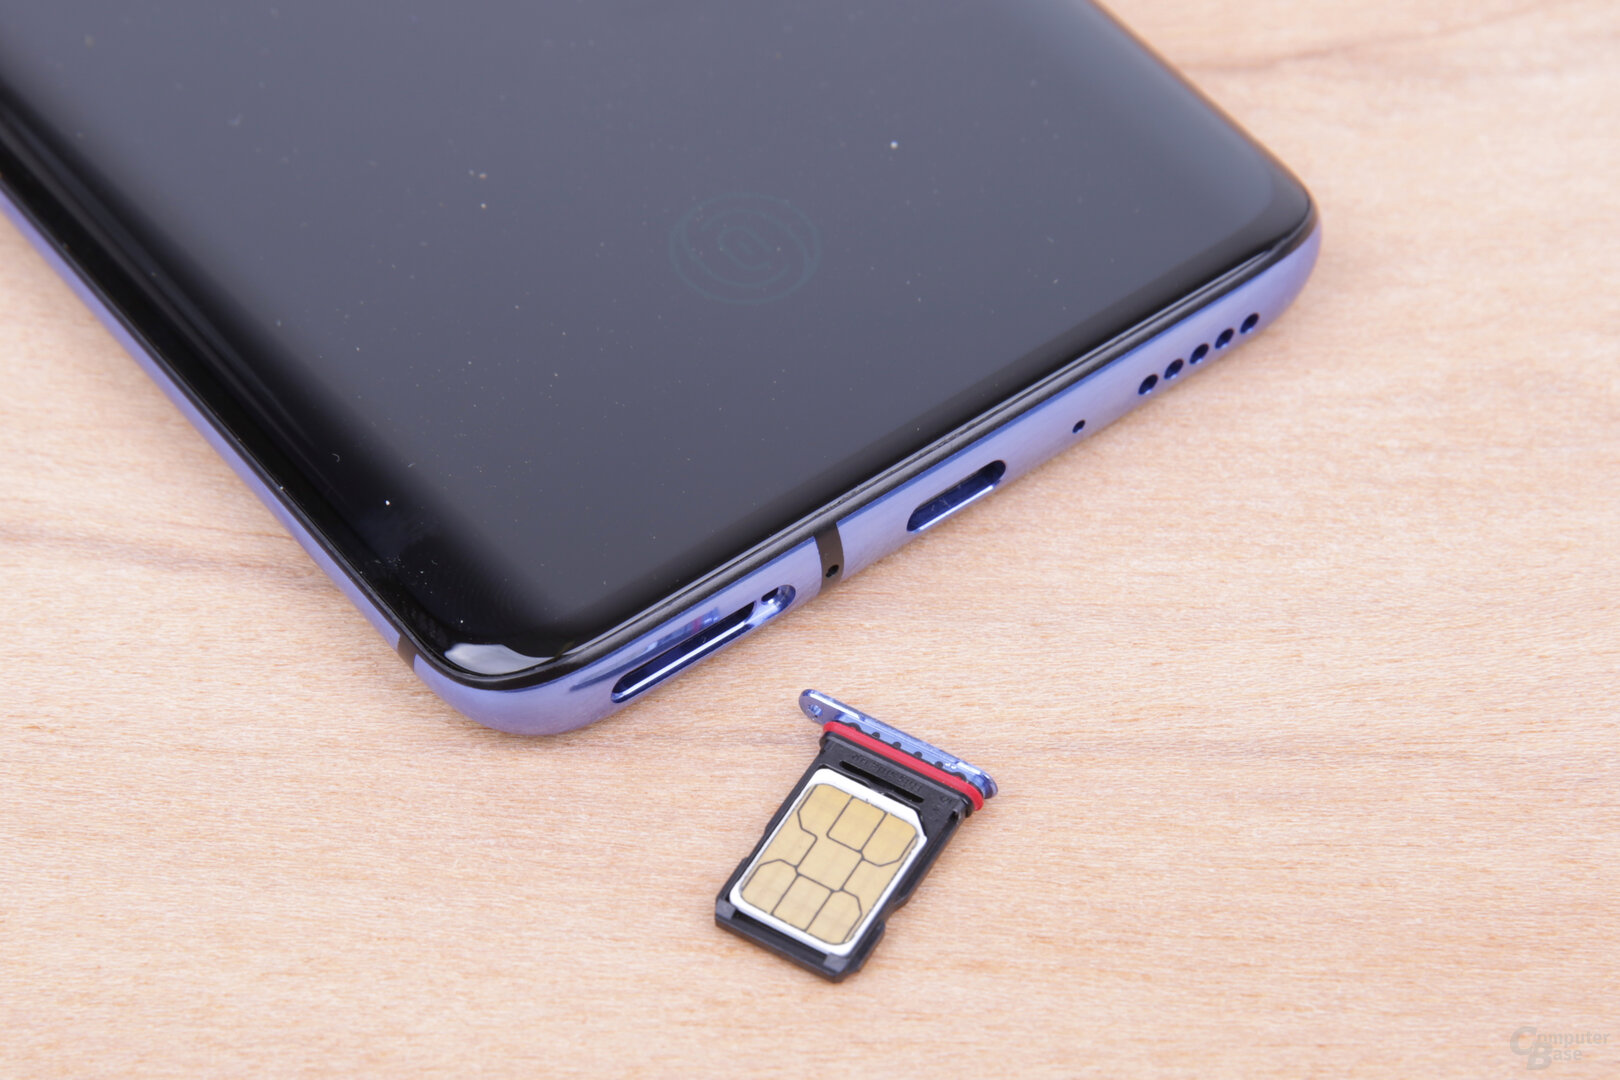 Am Nano-SIM-Fach ist ein Dichtungsring erkennbar